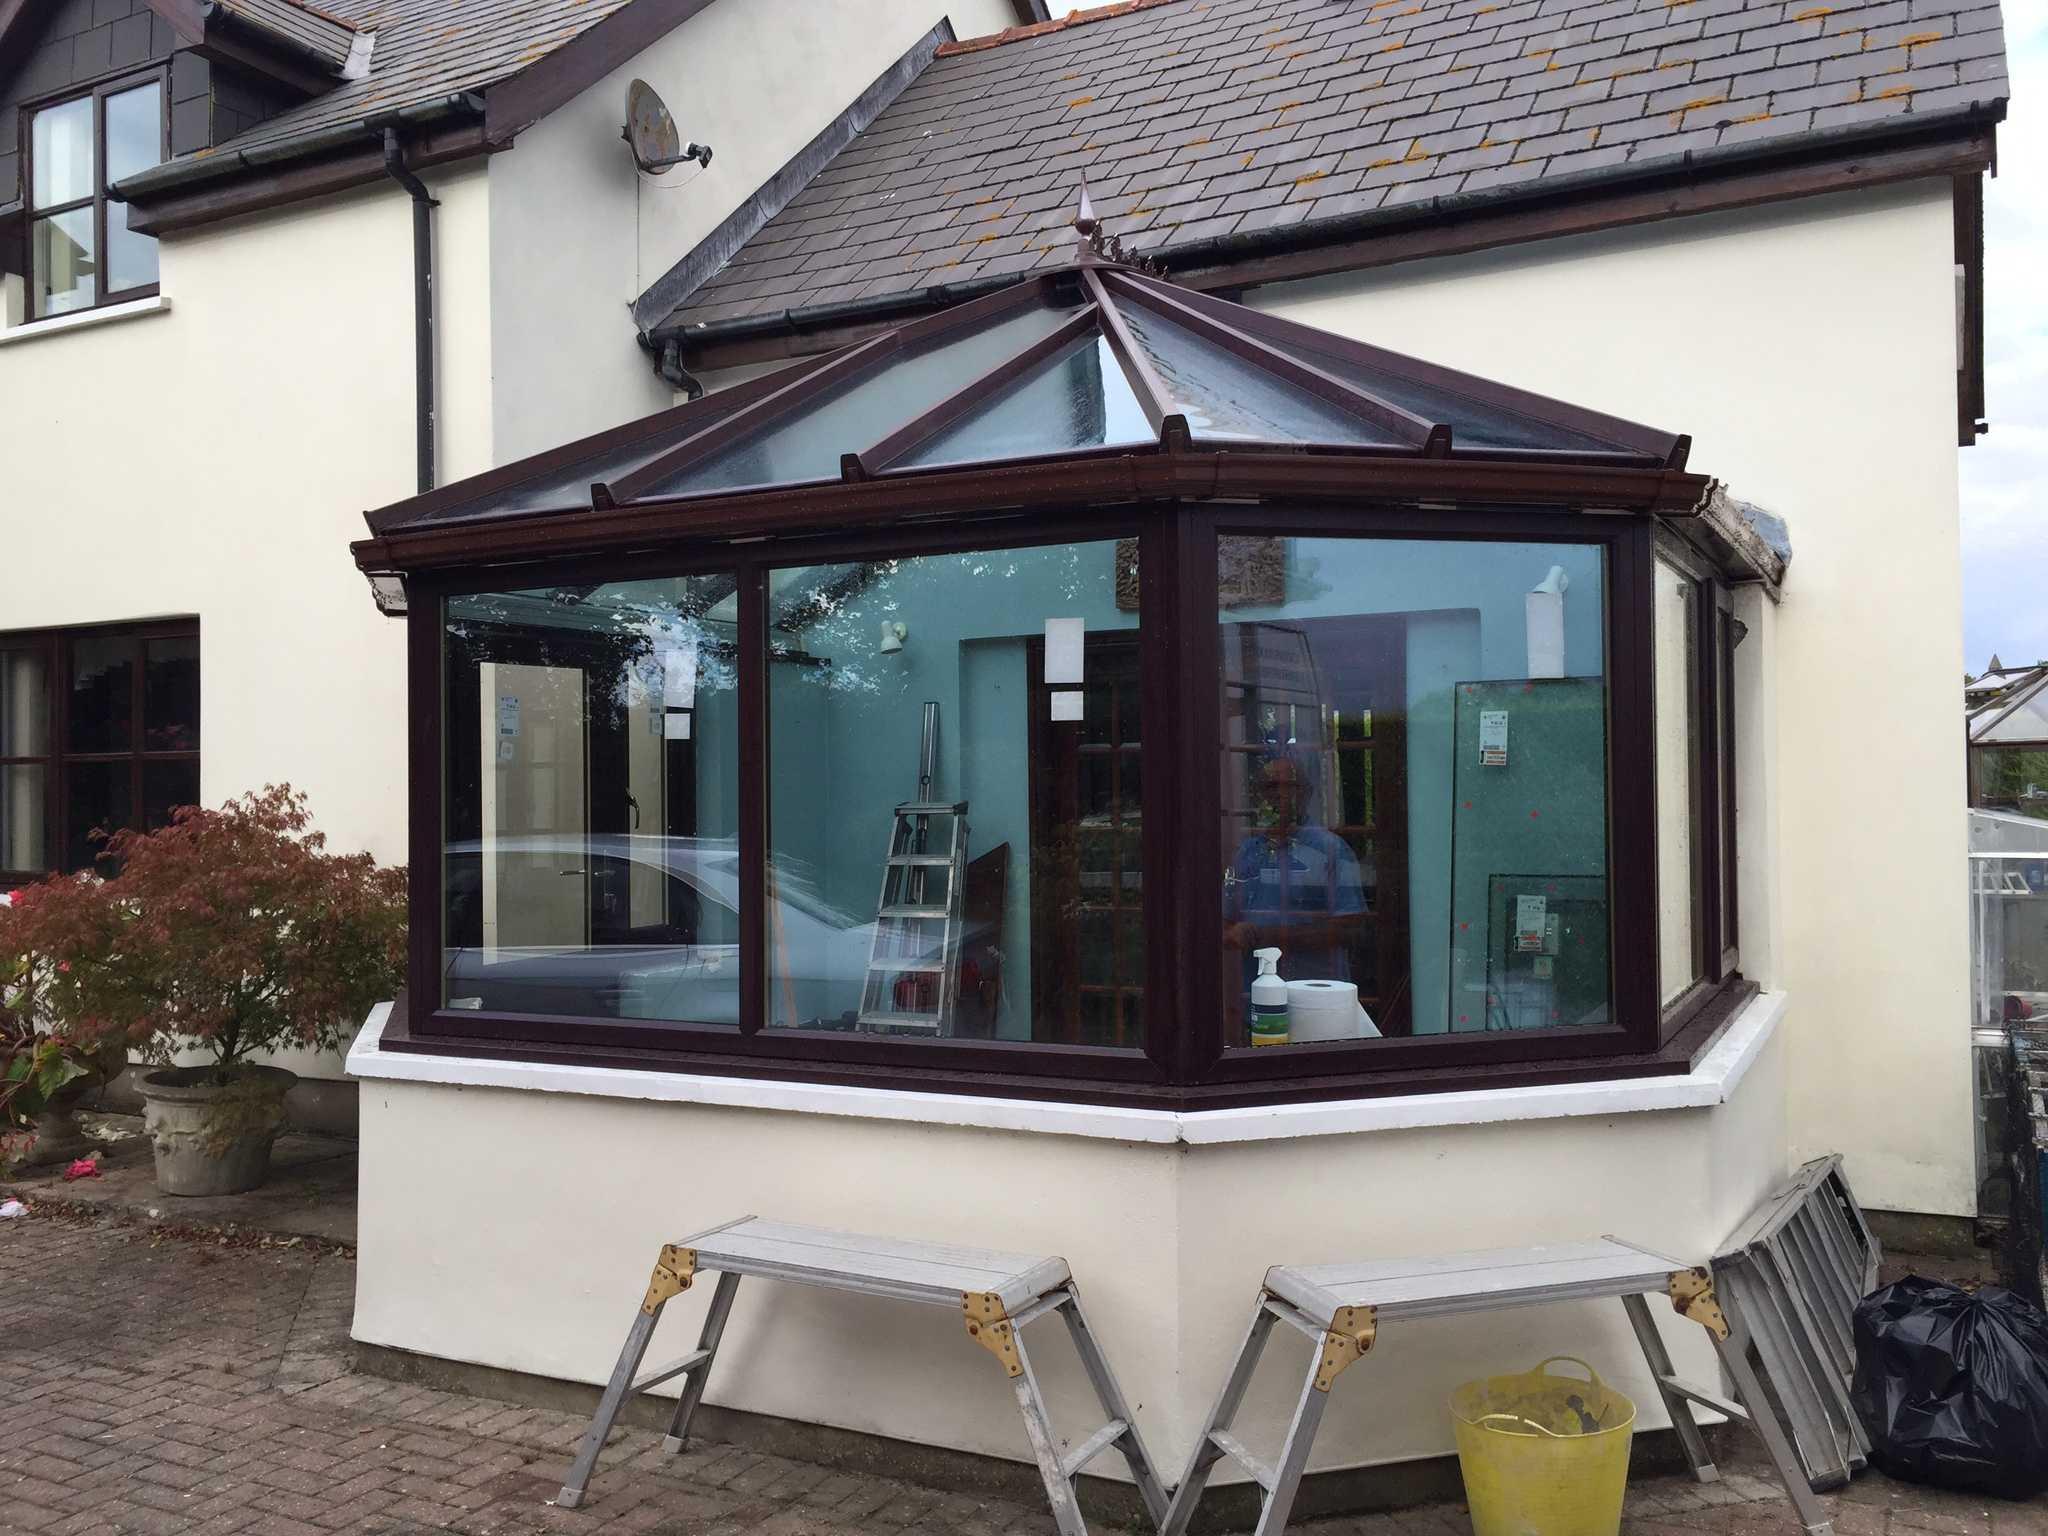 florence shapiro replacement windows - photo#16